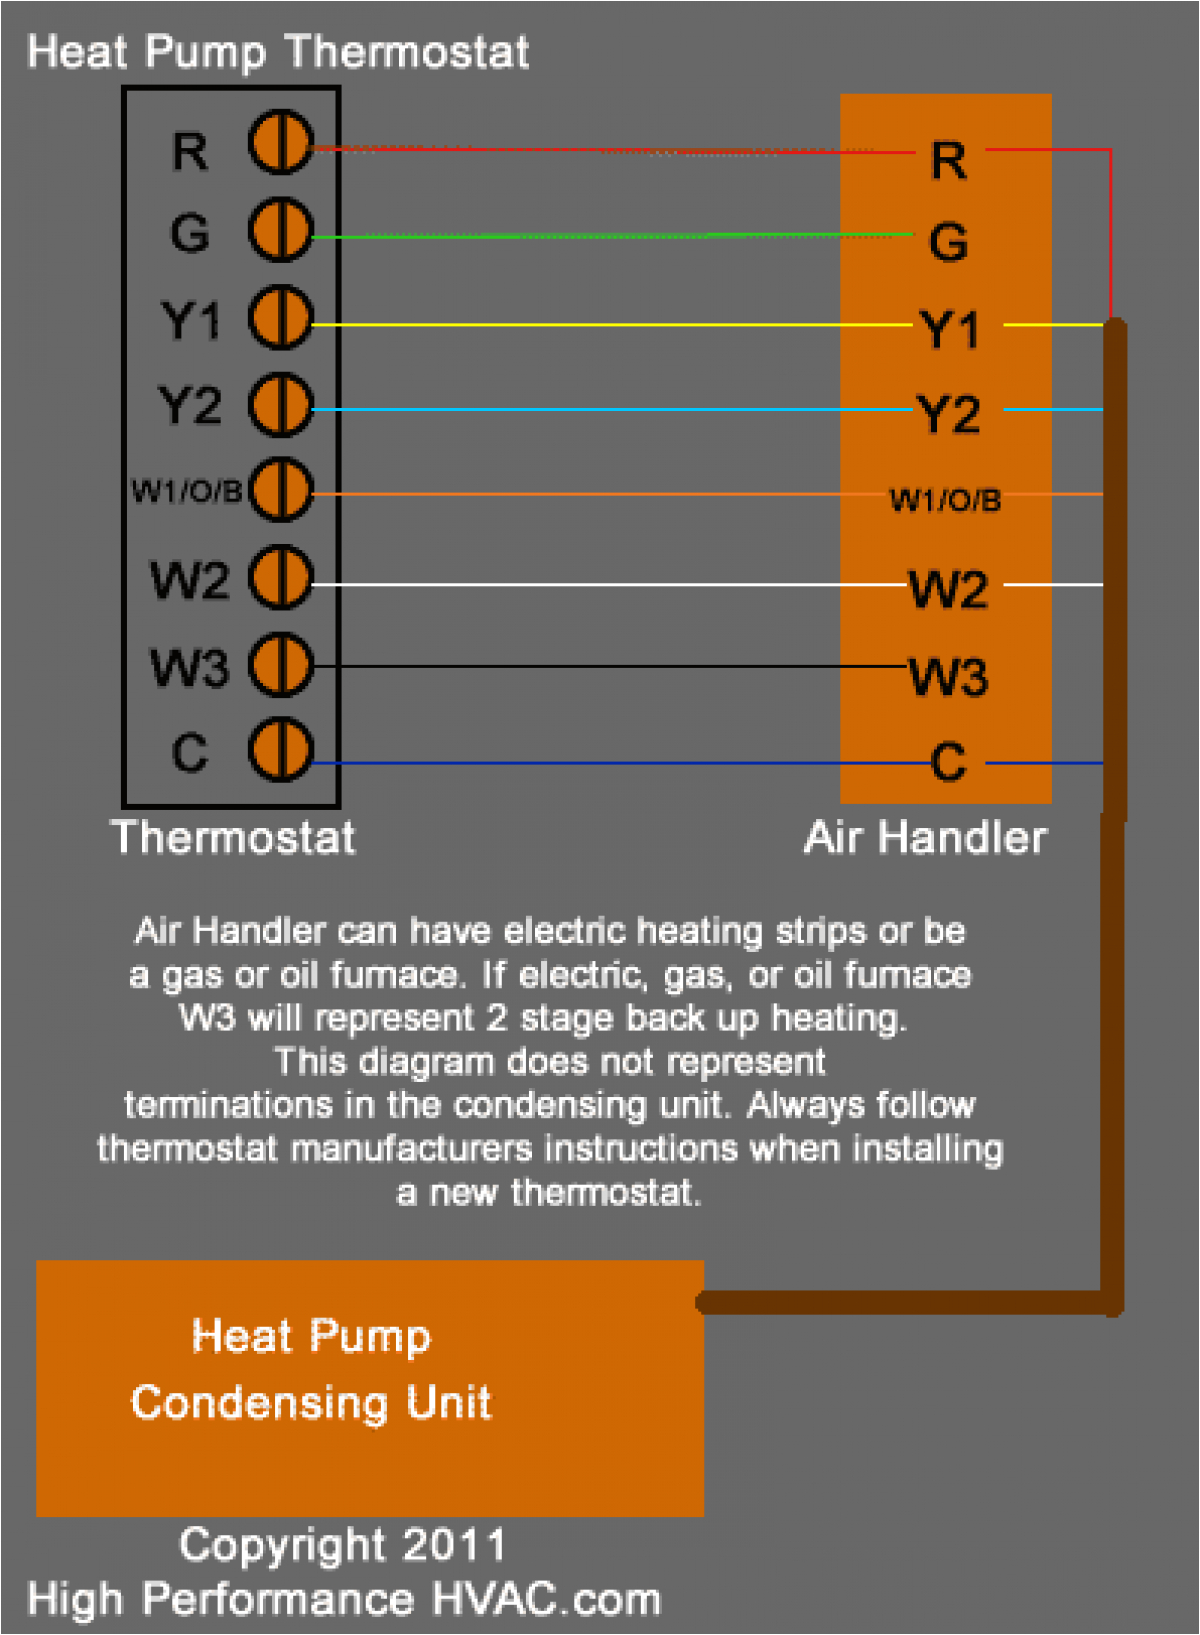 heat pump thermostat diagram 1200x1635 png